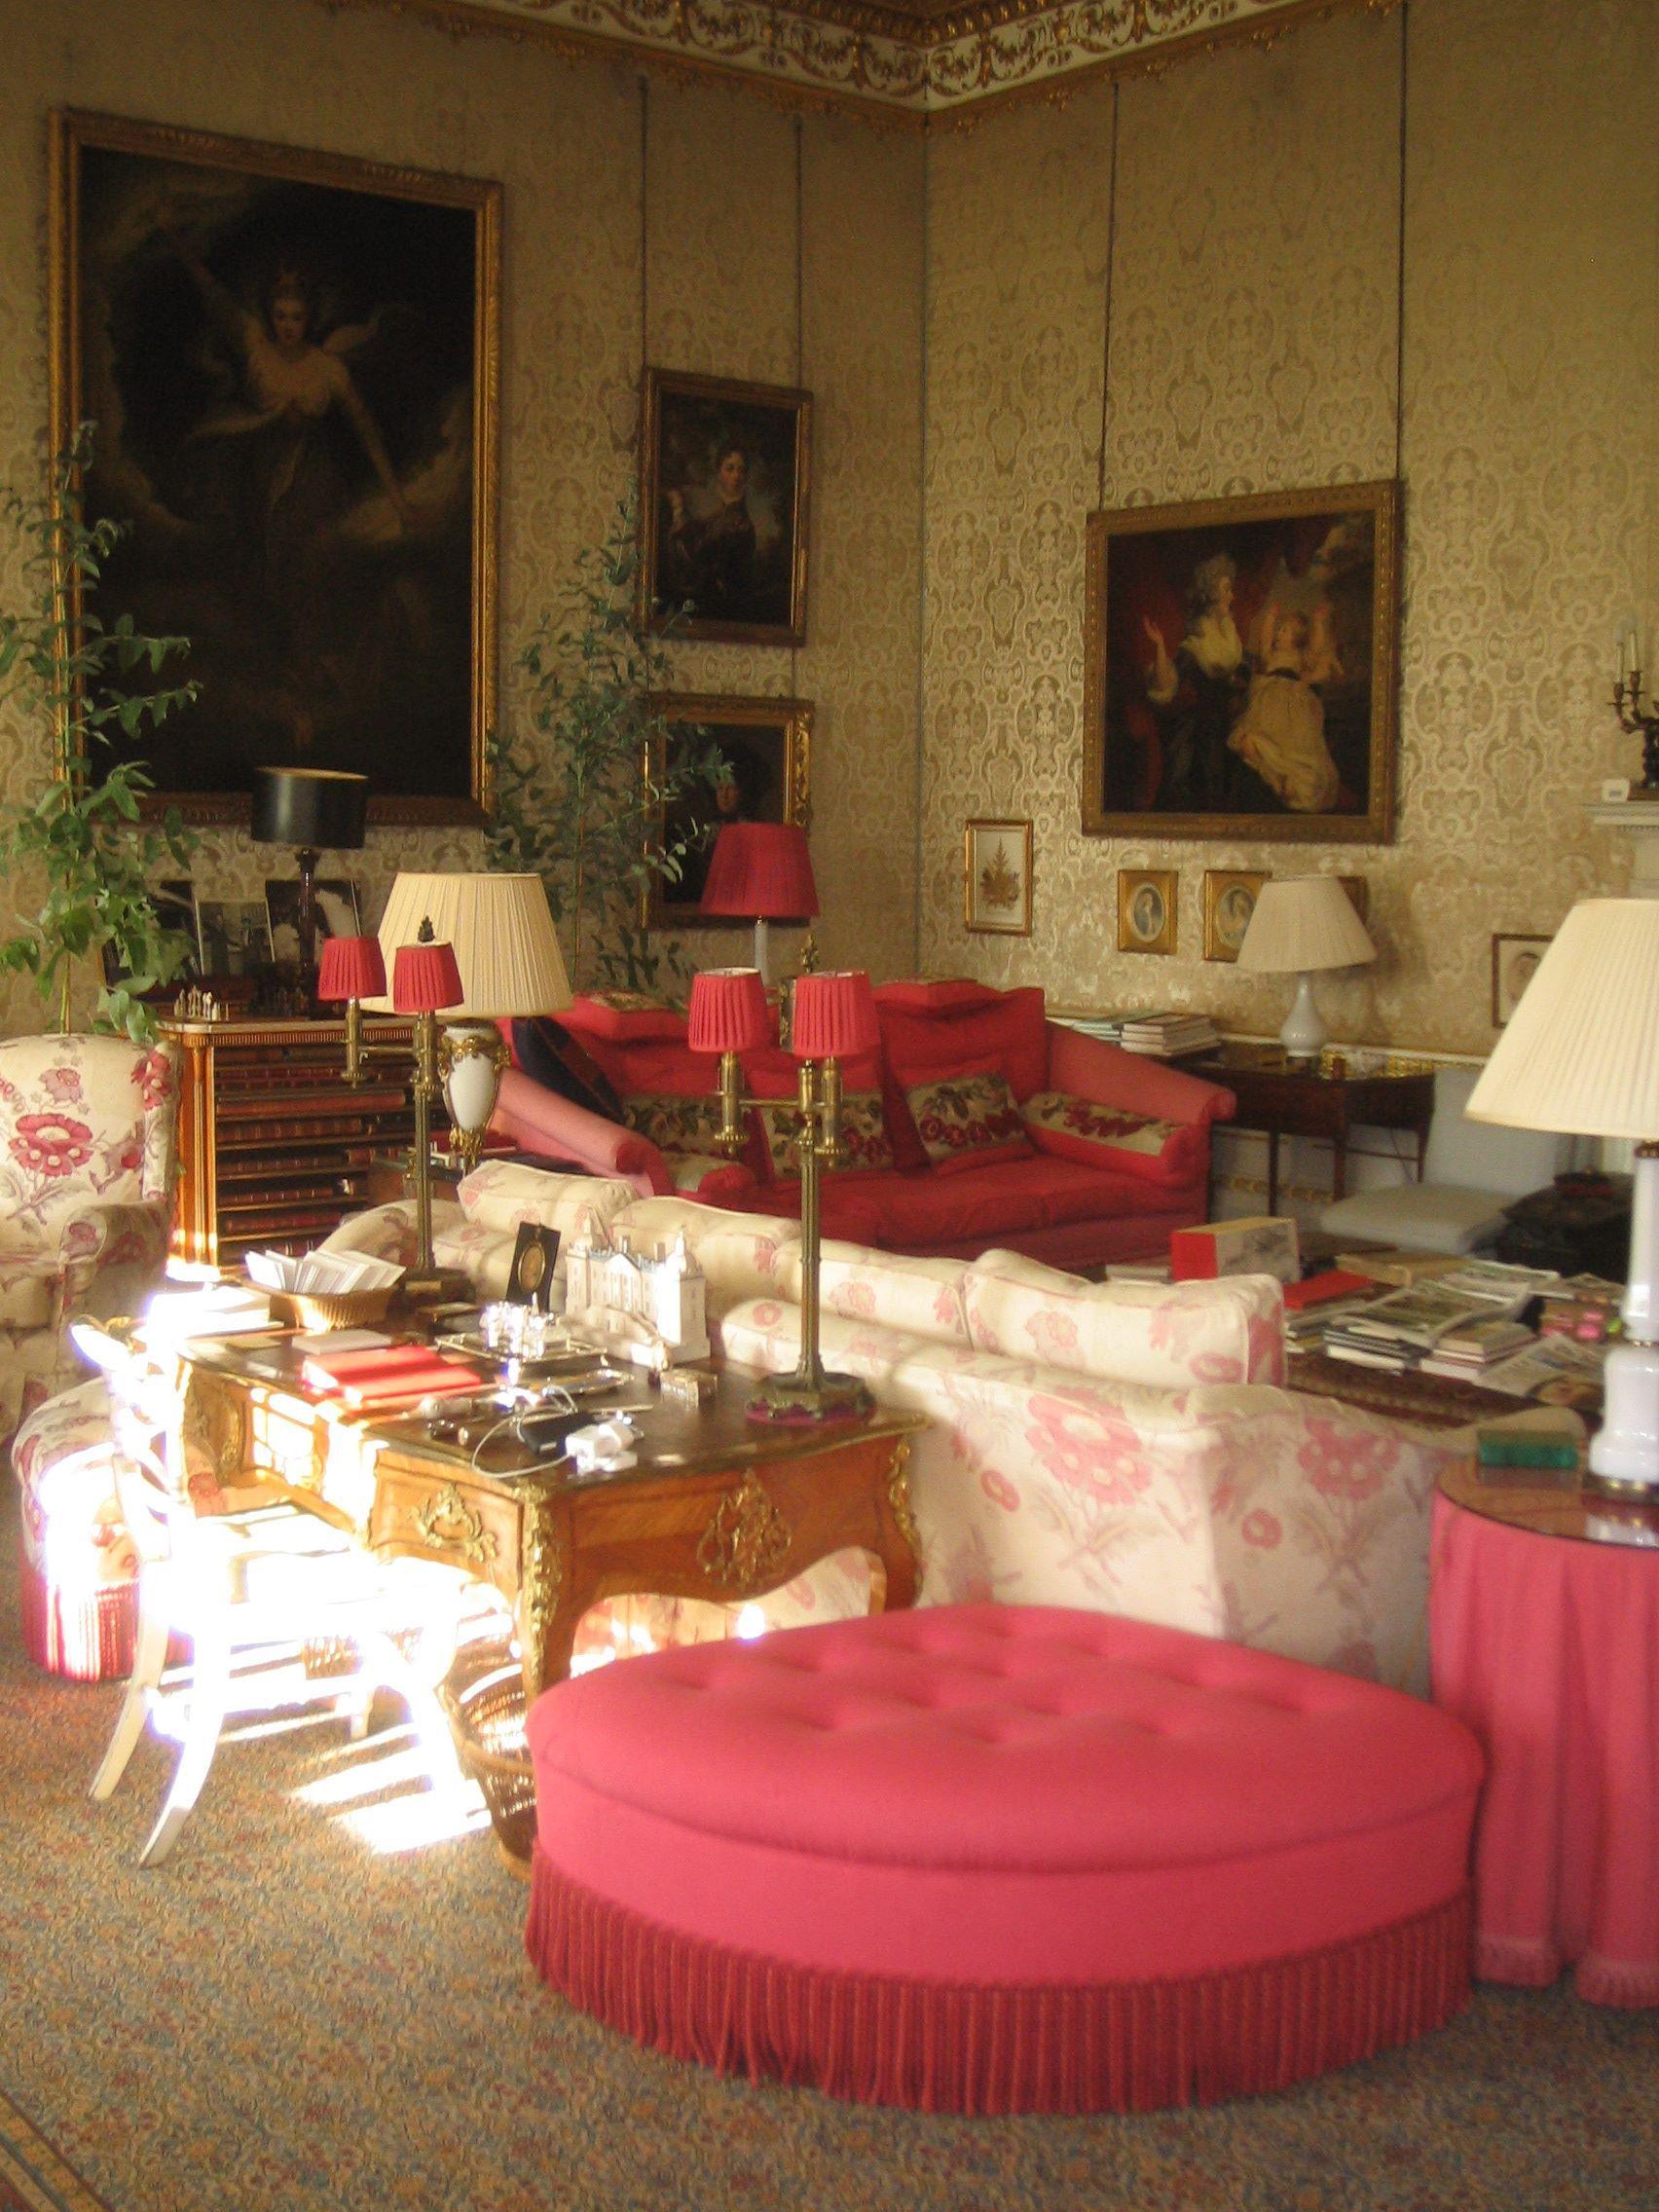 Drawinng Room: Chatsworth, Private Sitting Room. Robert KIme, #debo